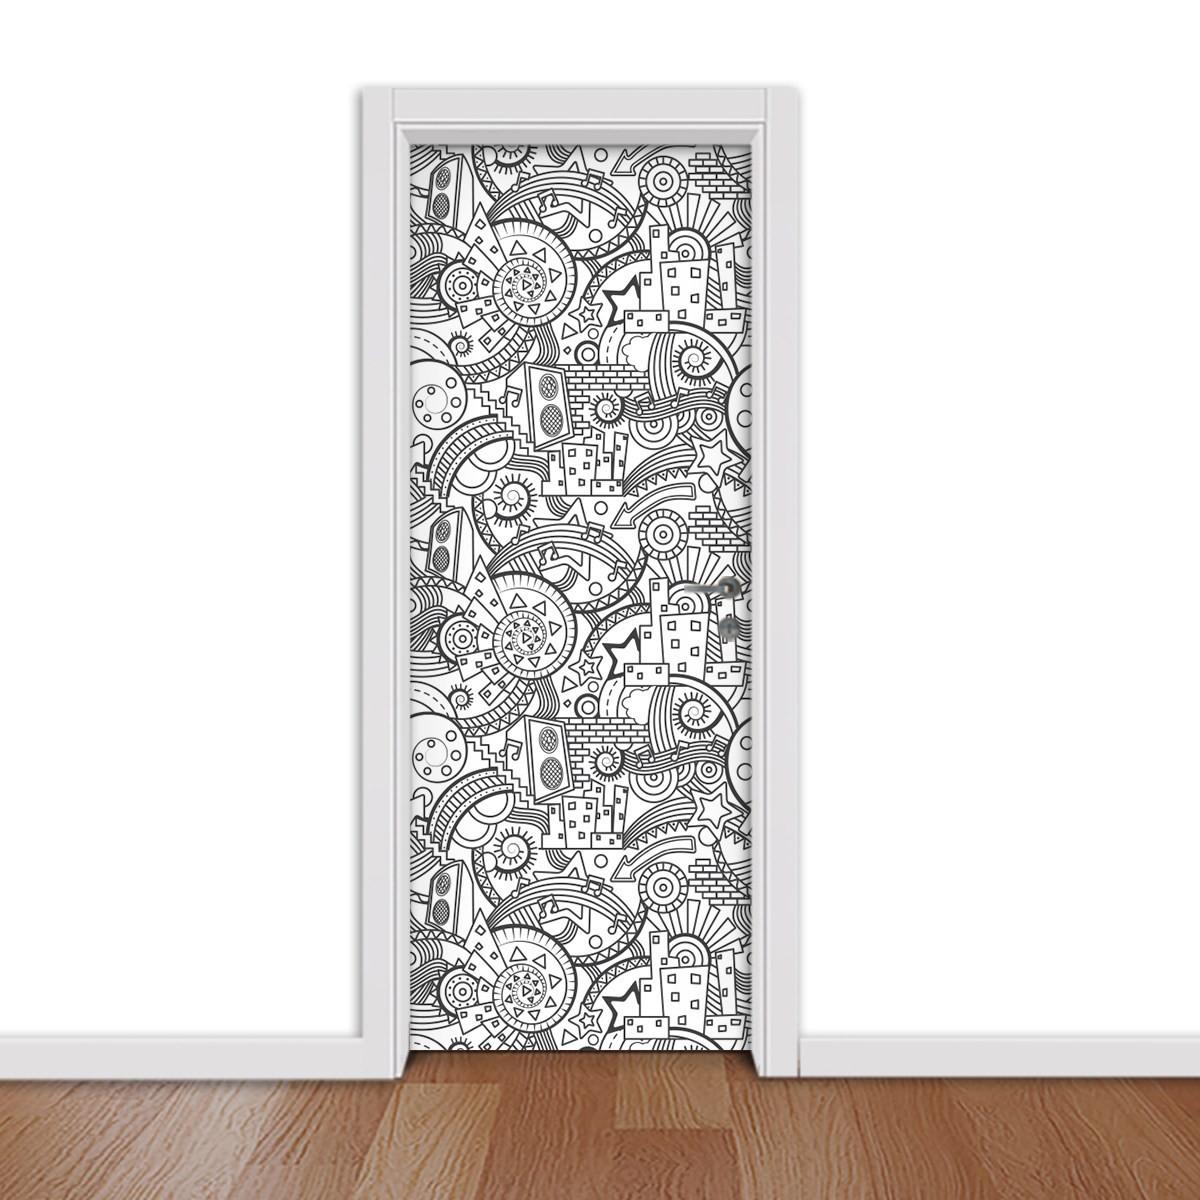 Adesivo (Sticker) Para Porta: Desenho (Preto e Branco)